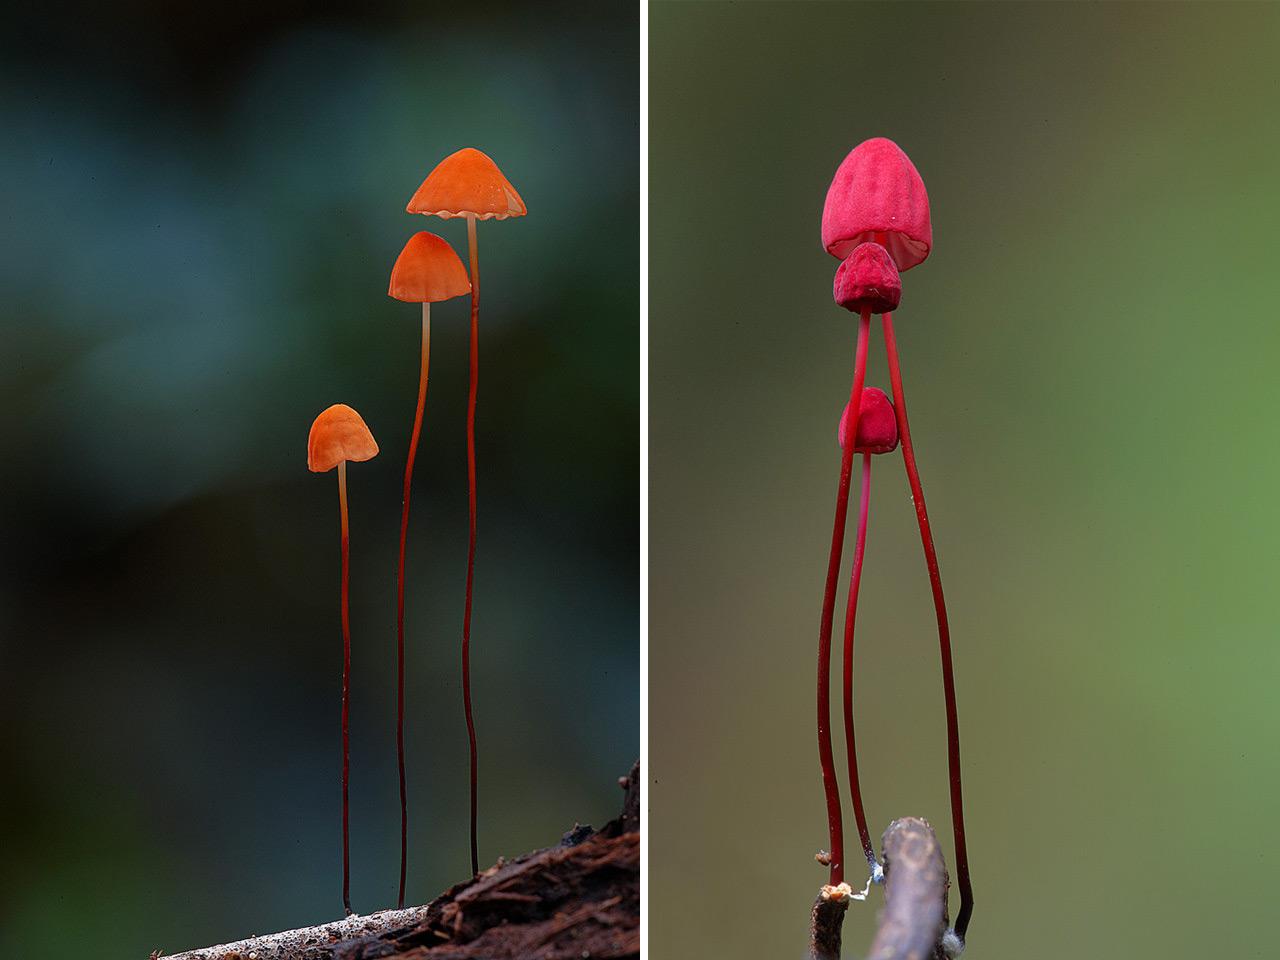 Fungi - Mushroom - Steve Axford  - 11